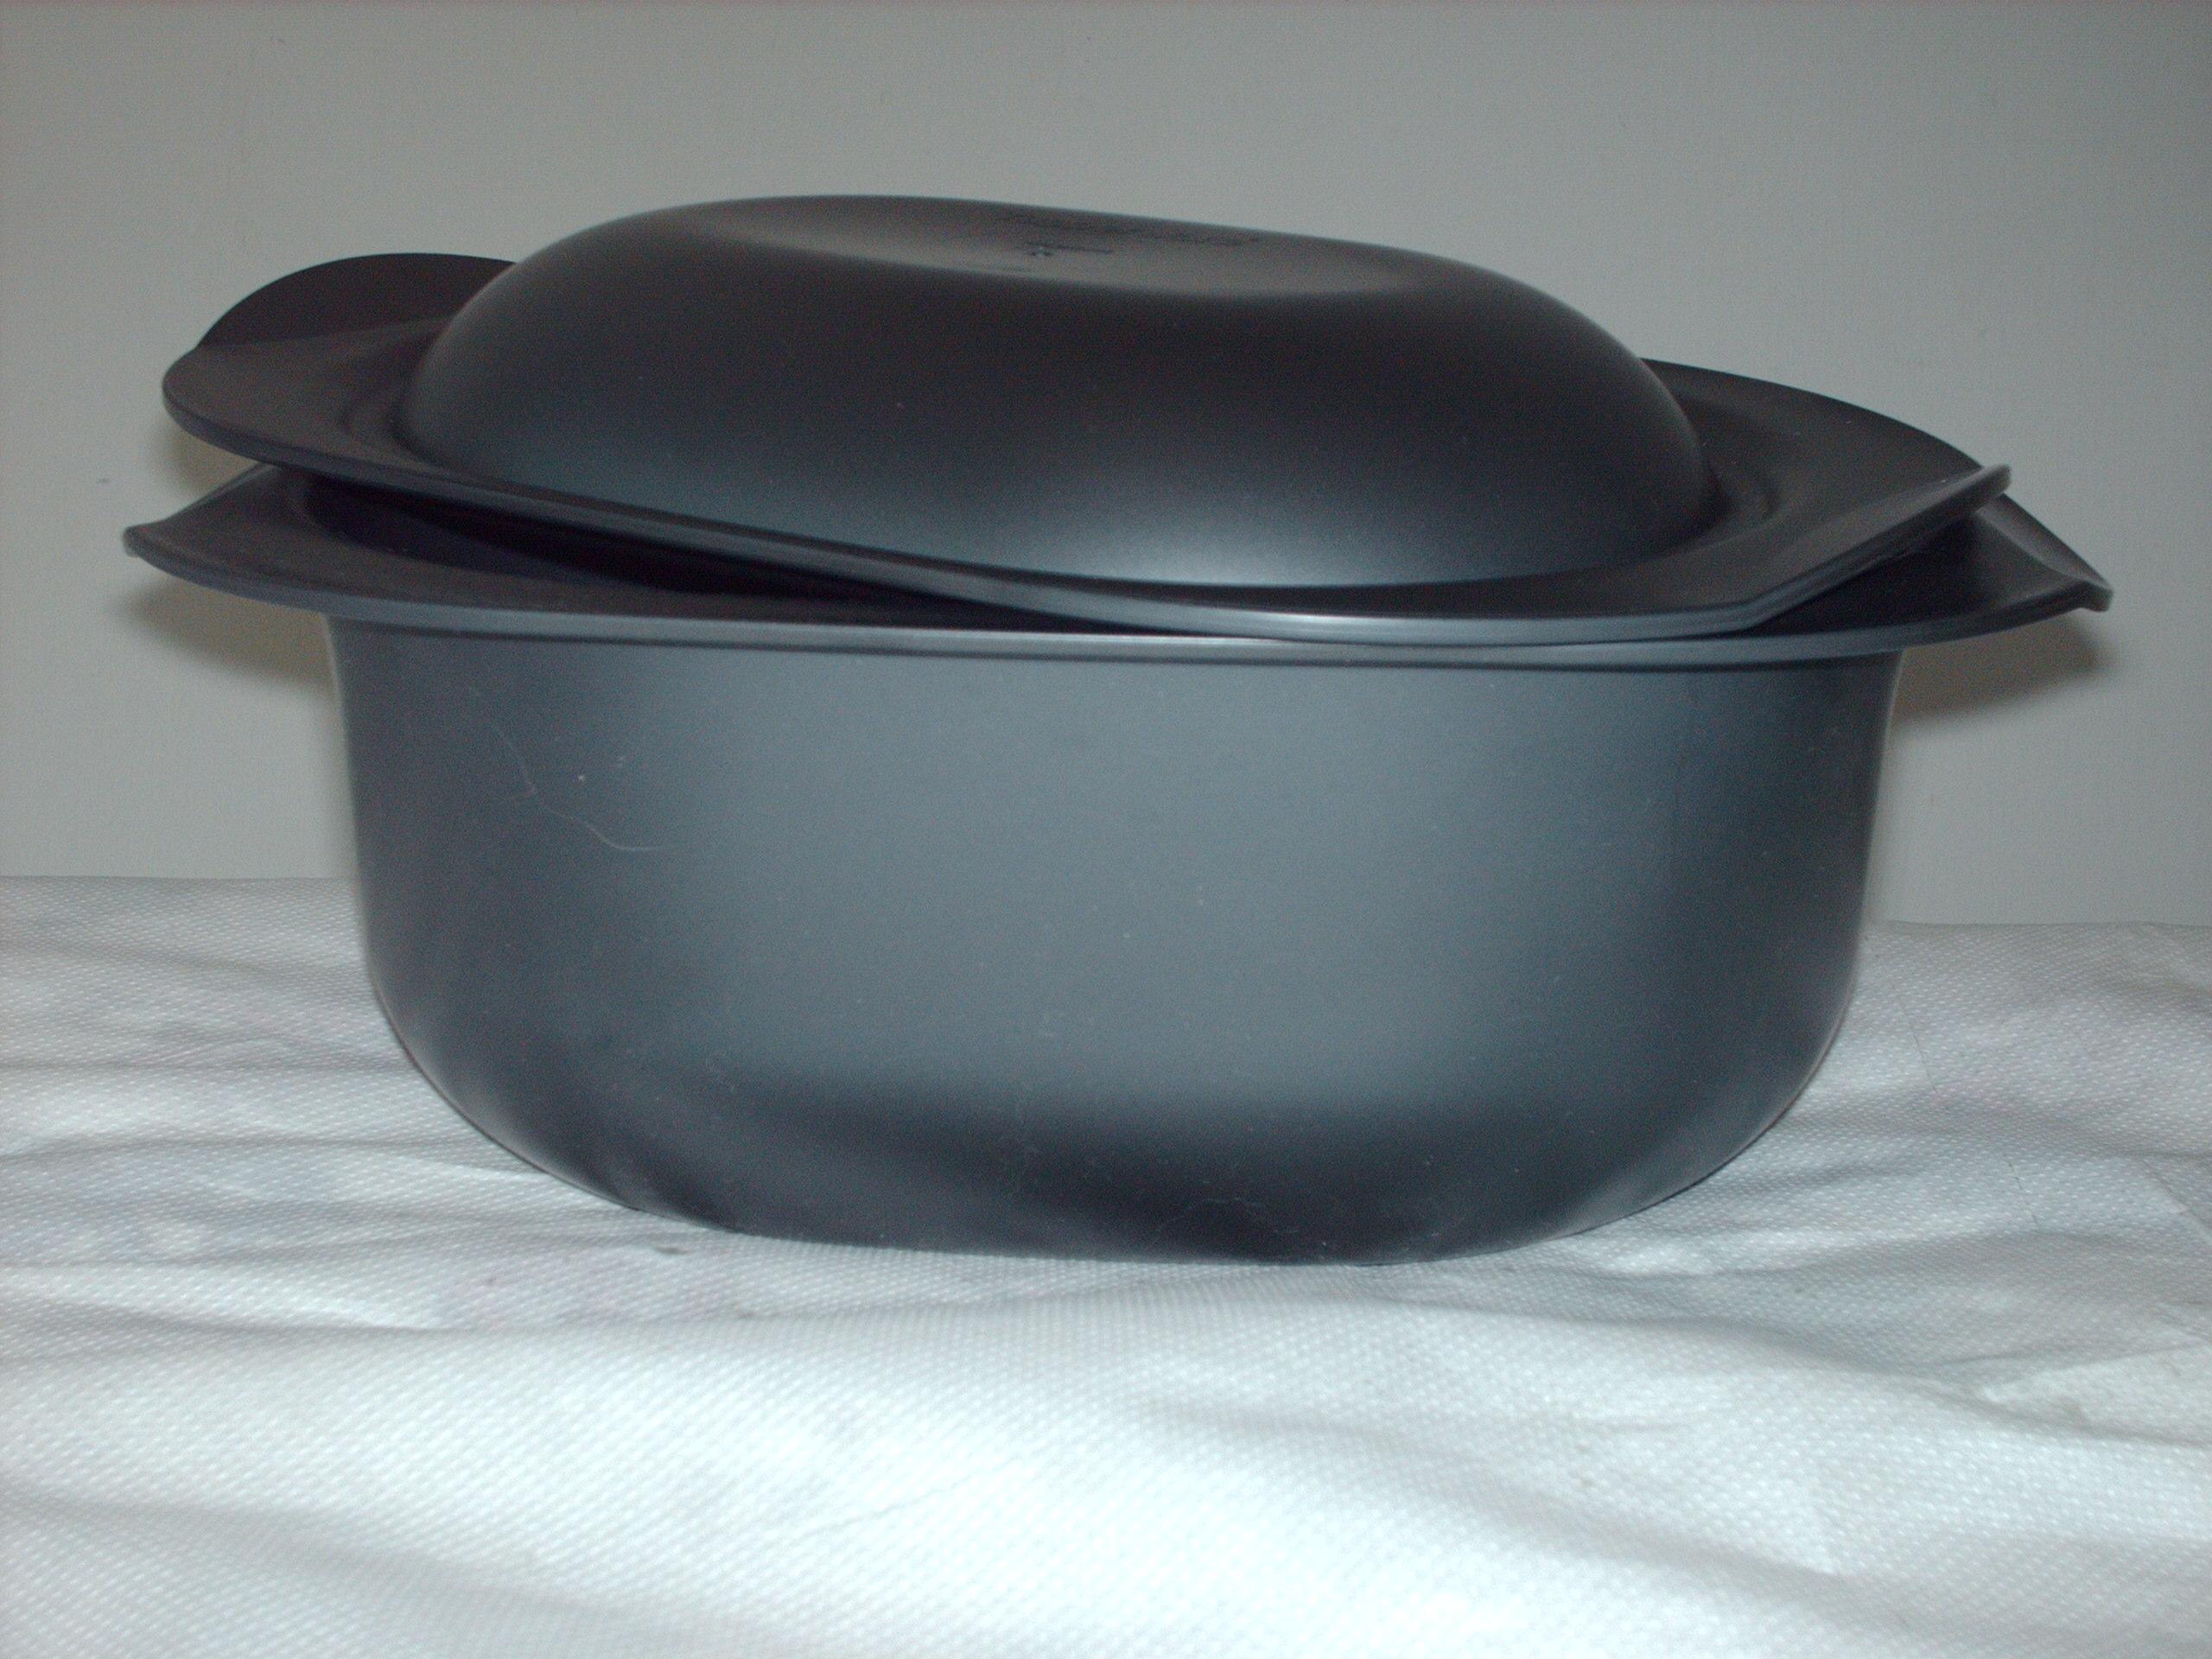 file tupperware ultraplus jpg wikimedia commons. Black Bedroom Furniture Sets. Home Design Ideas